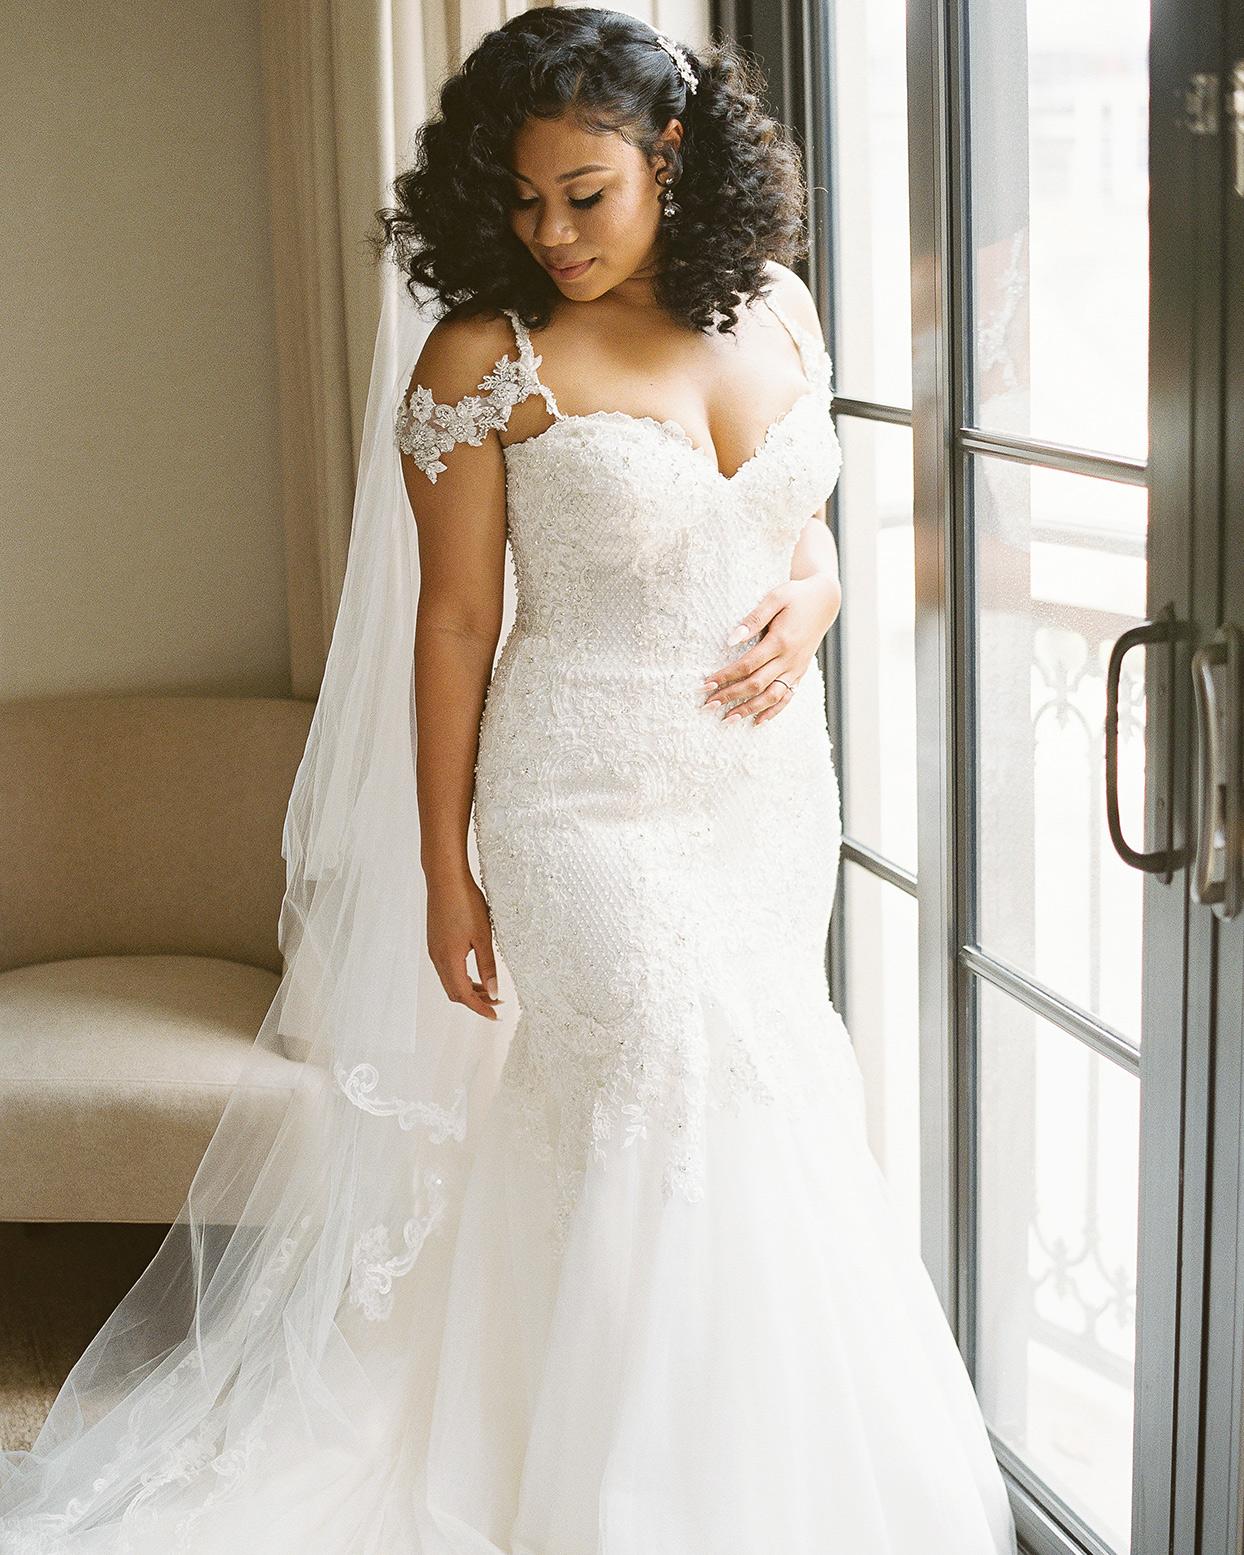 amelia justin wedding bride in white dress by window